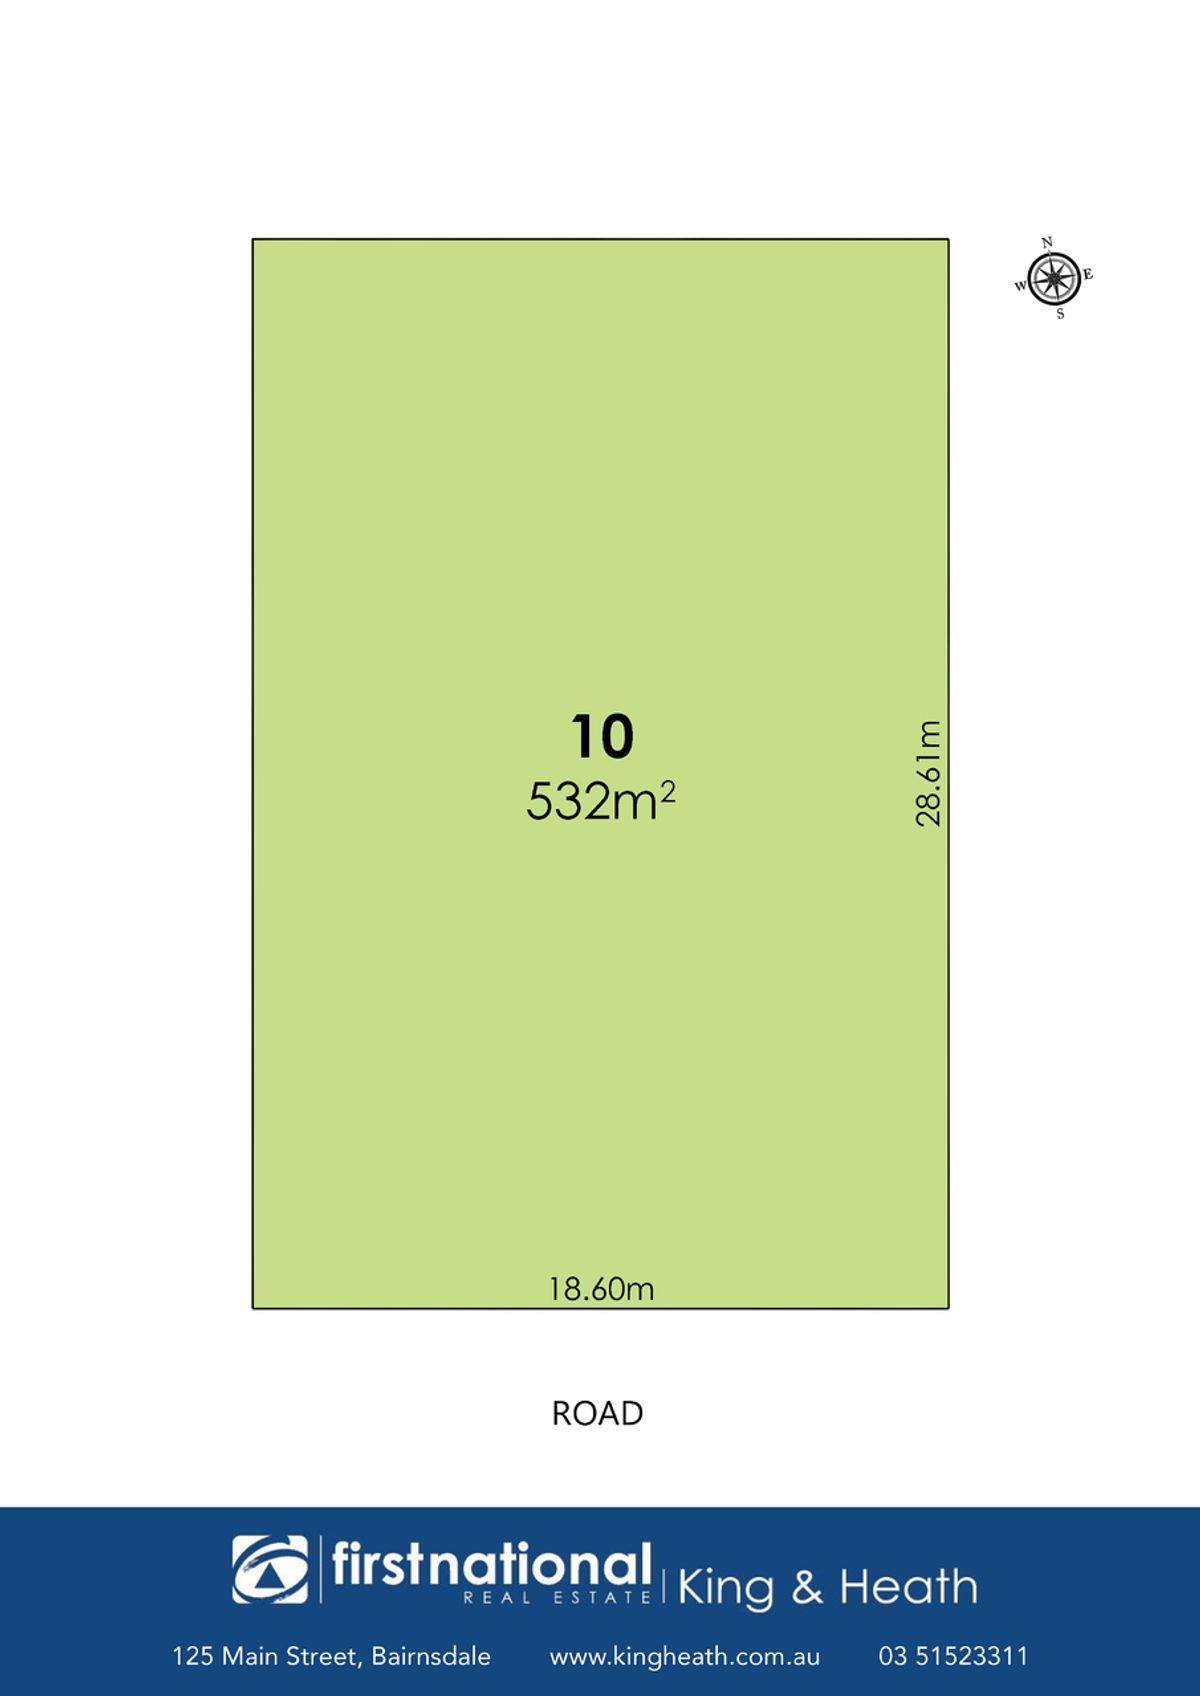 Lot 10, 10 Crooke Street, East Bairnsdale, VIC 3875